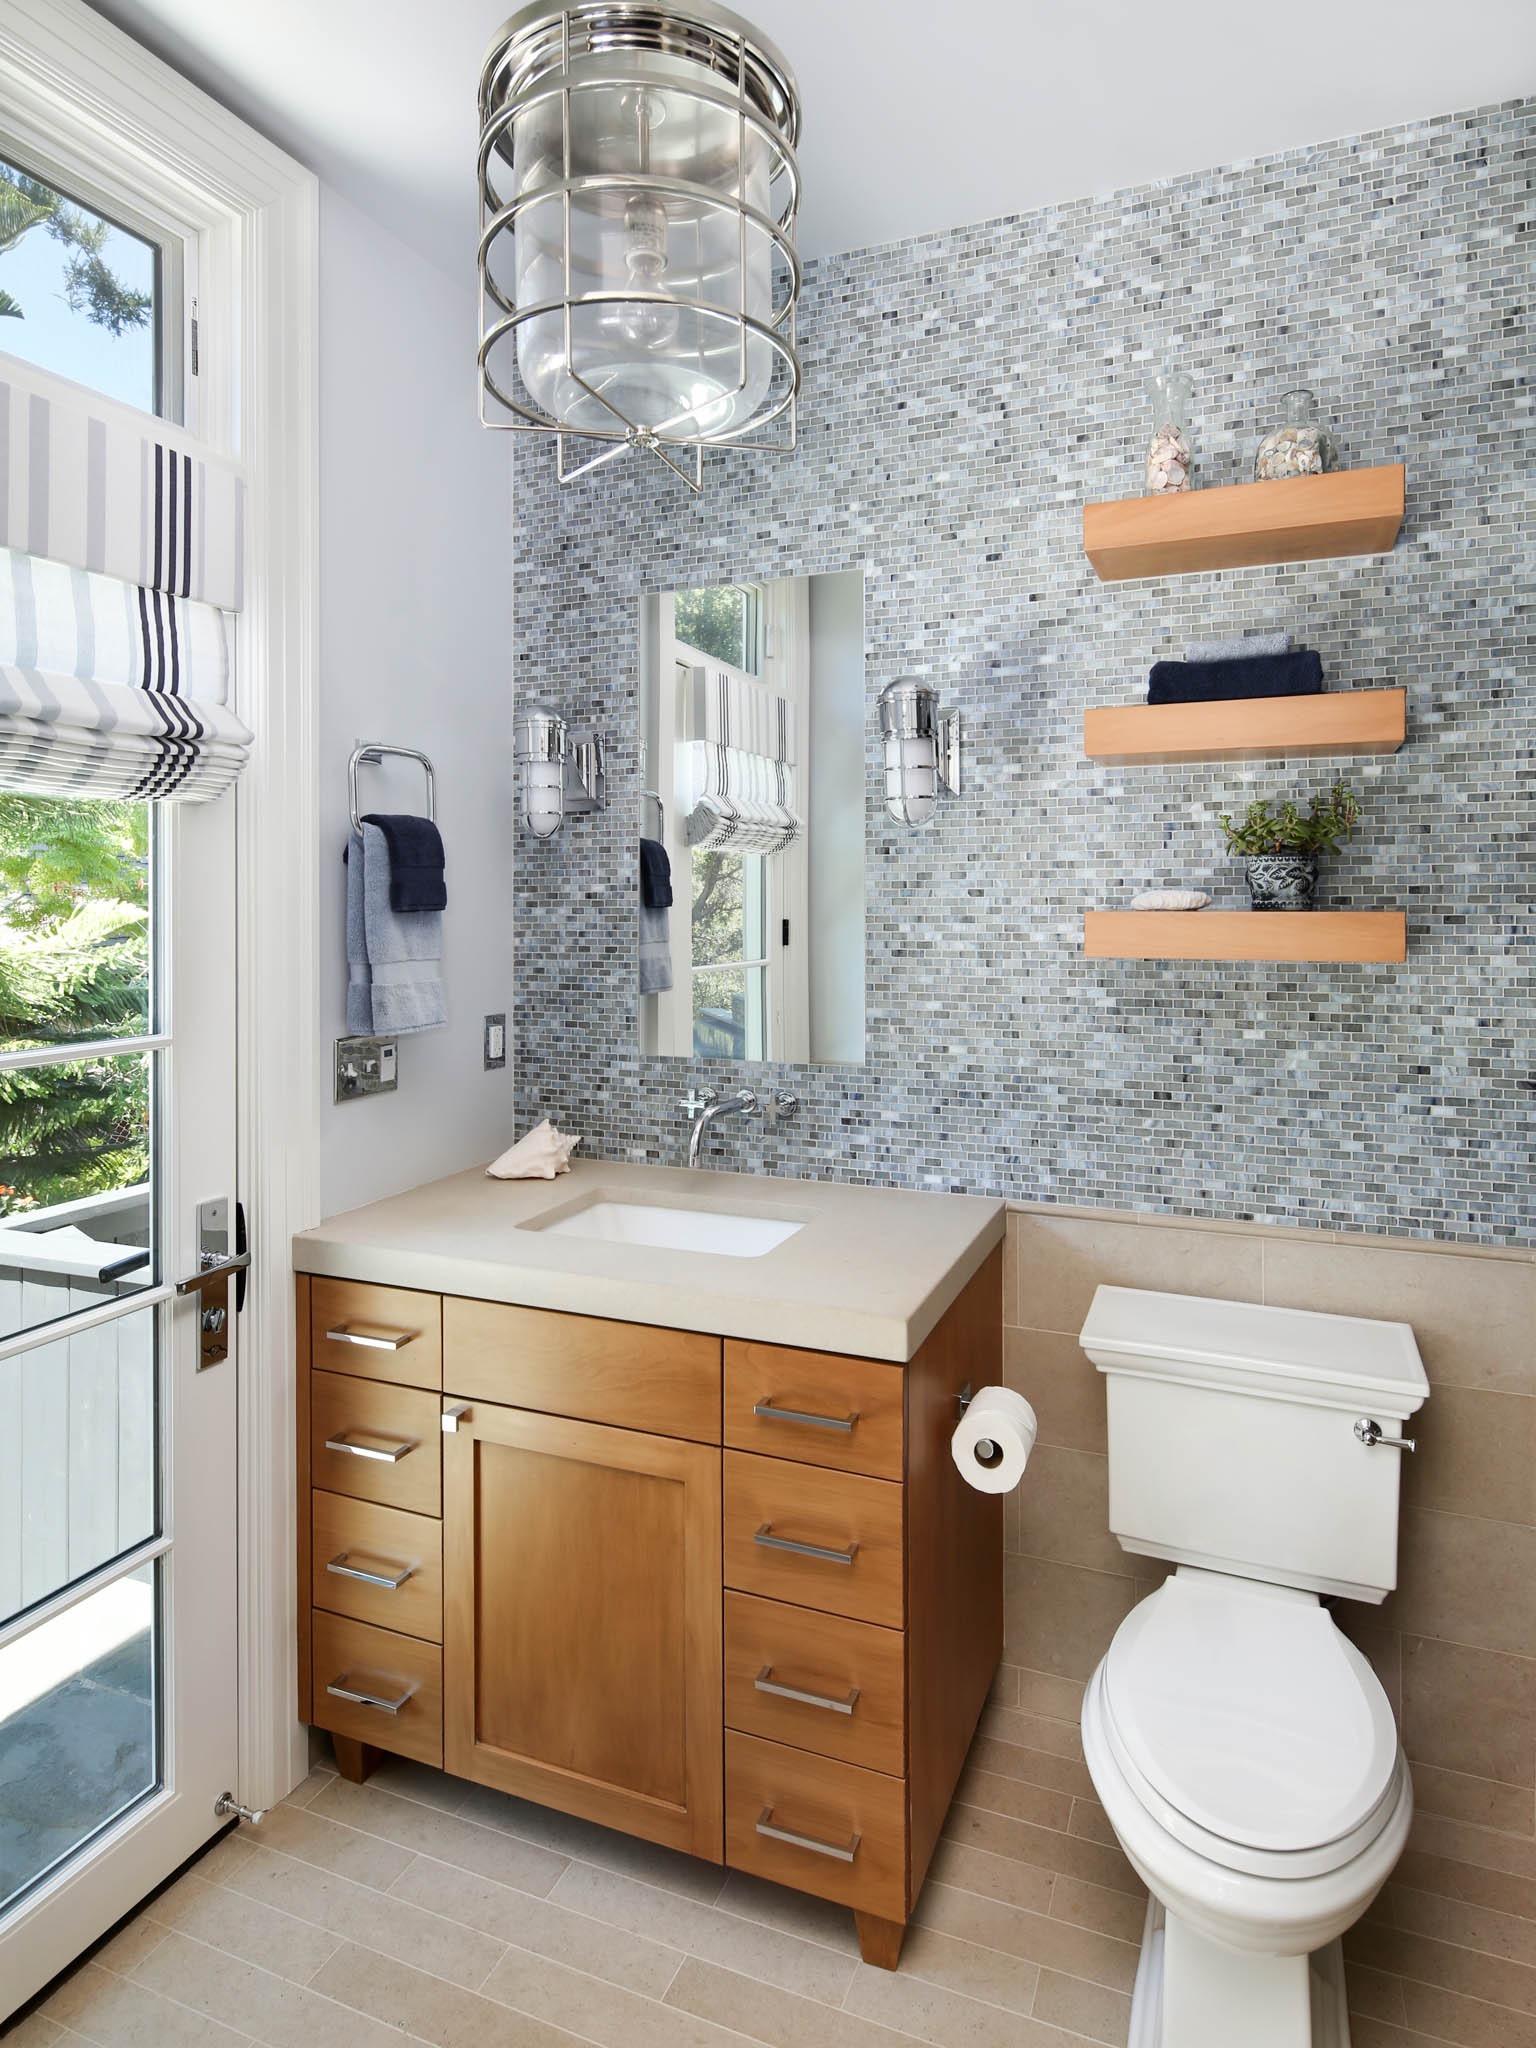 Modern Floating Shelves And Wood Vanity Storage For Modern Bathroom (Image 12 of 20)